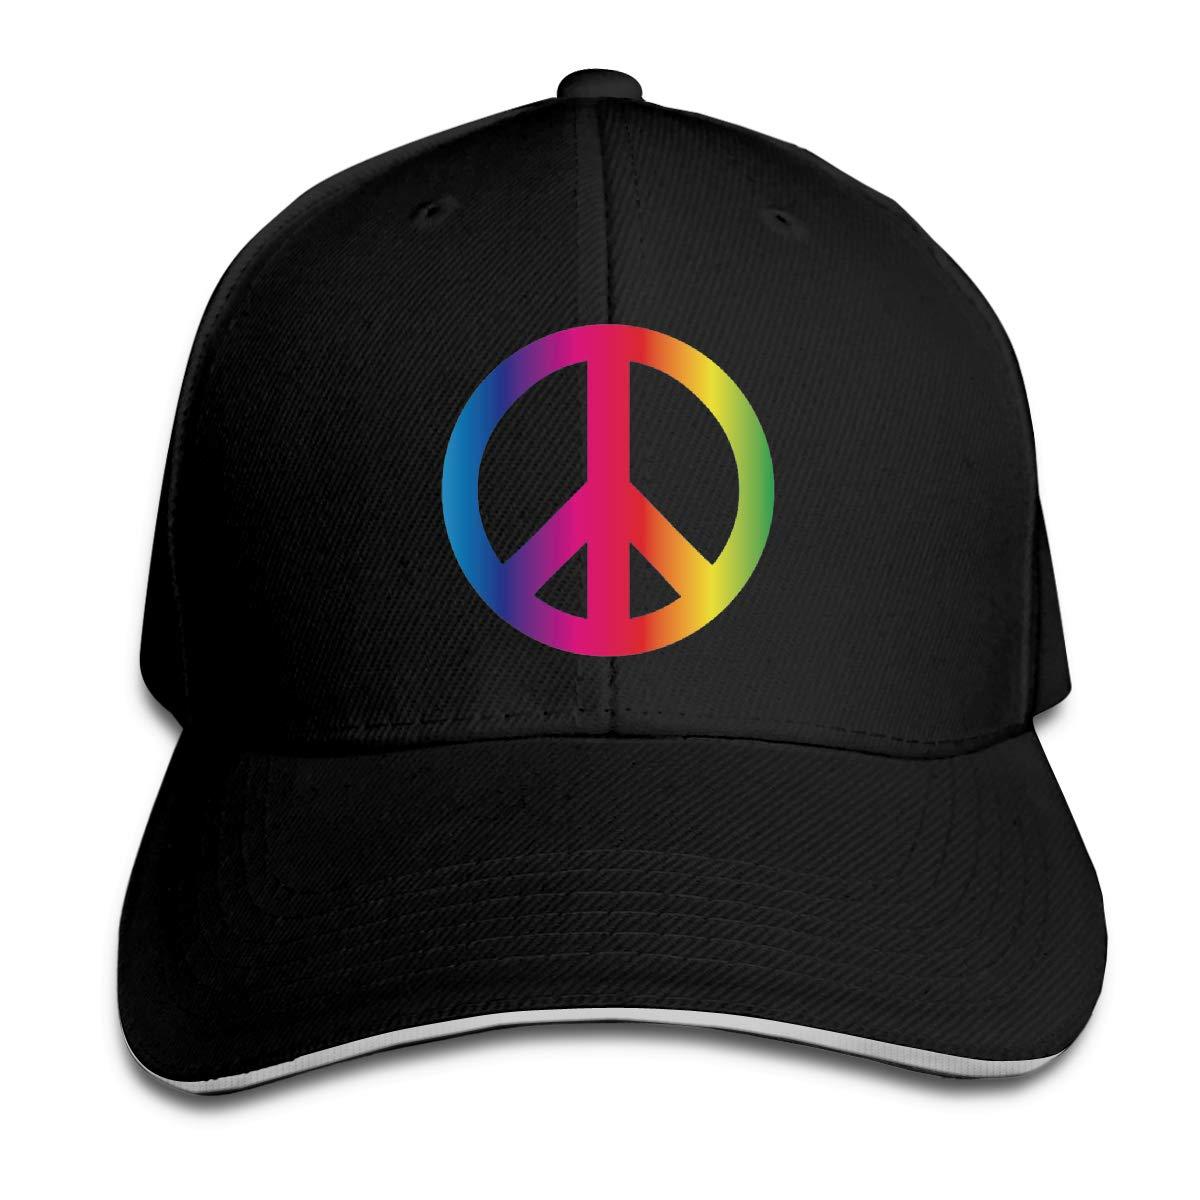 Rainbow Peace Sign Pride Classic Adjustable Cotton Baseball Caps Trucker Driver Hat Outdoor Cap Black